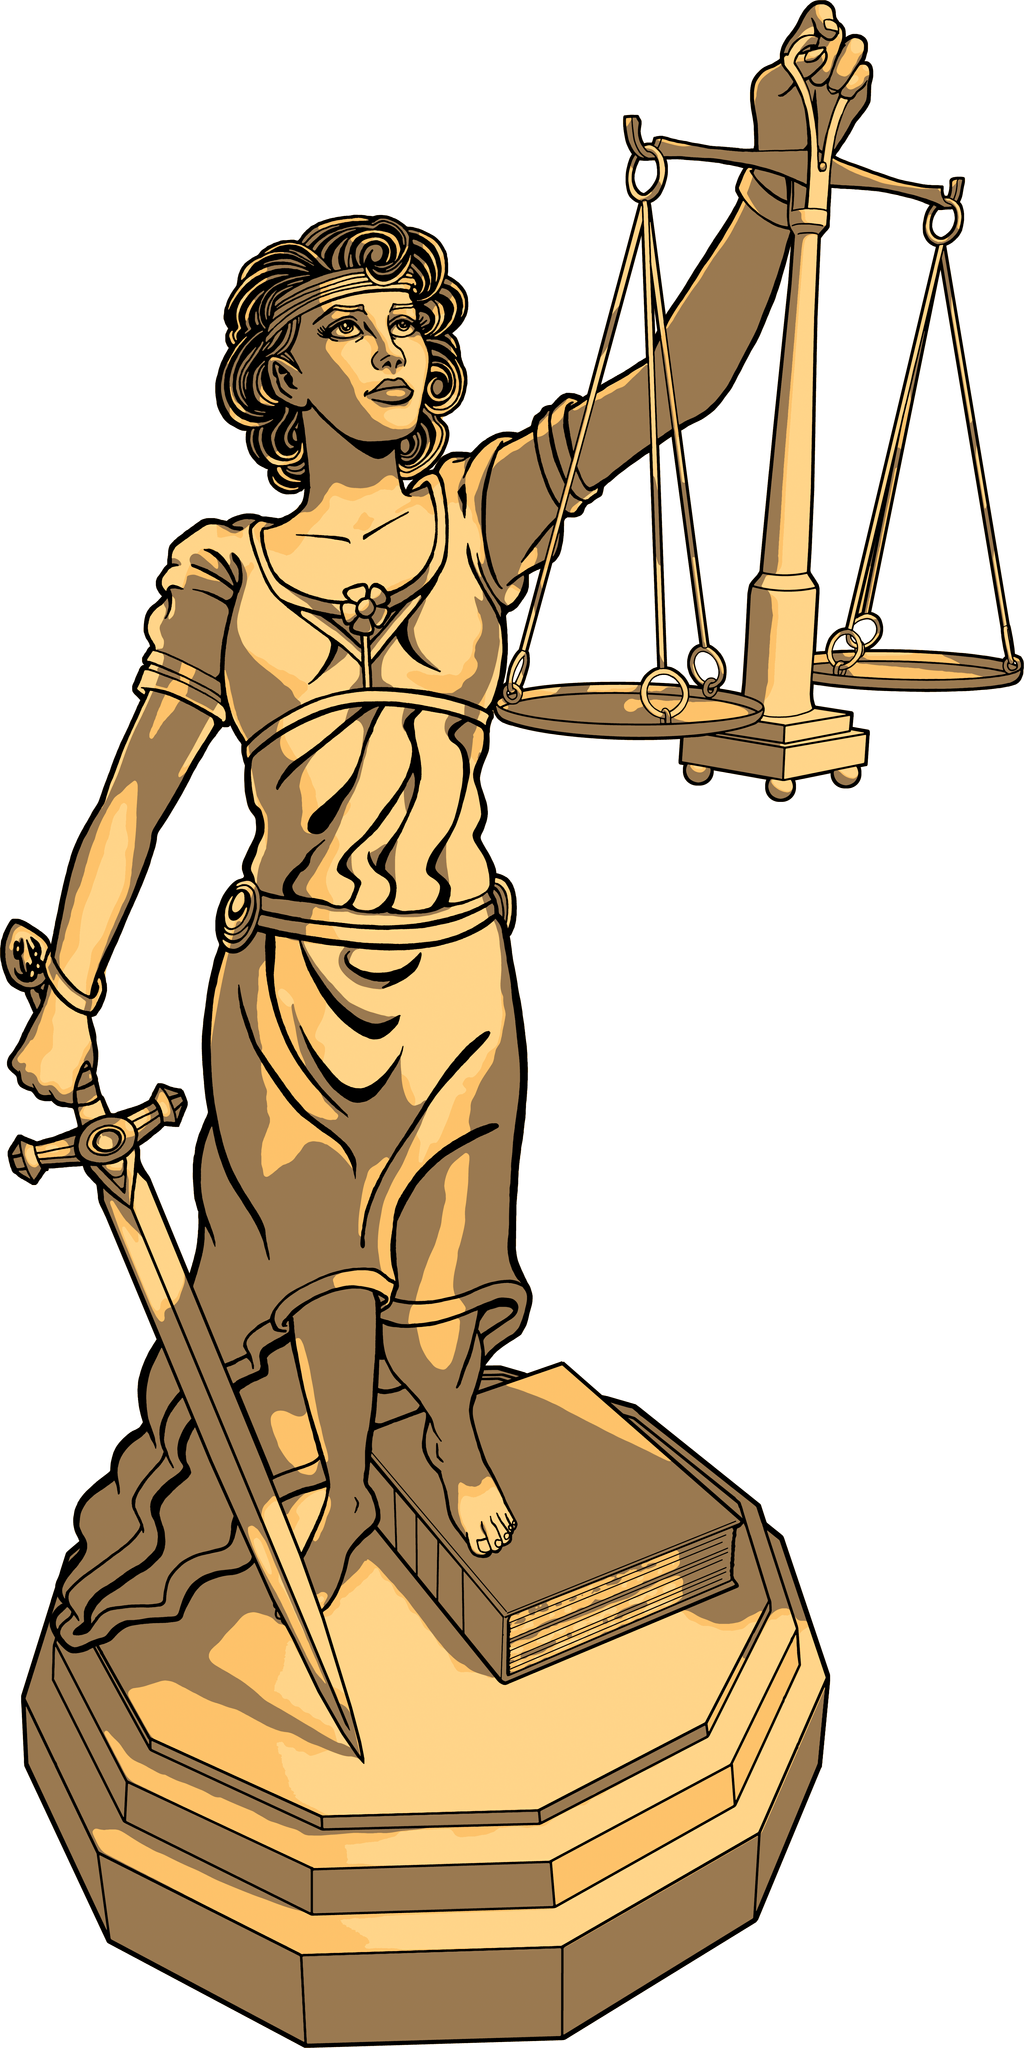 Lady Justice by tygerbug